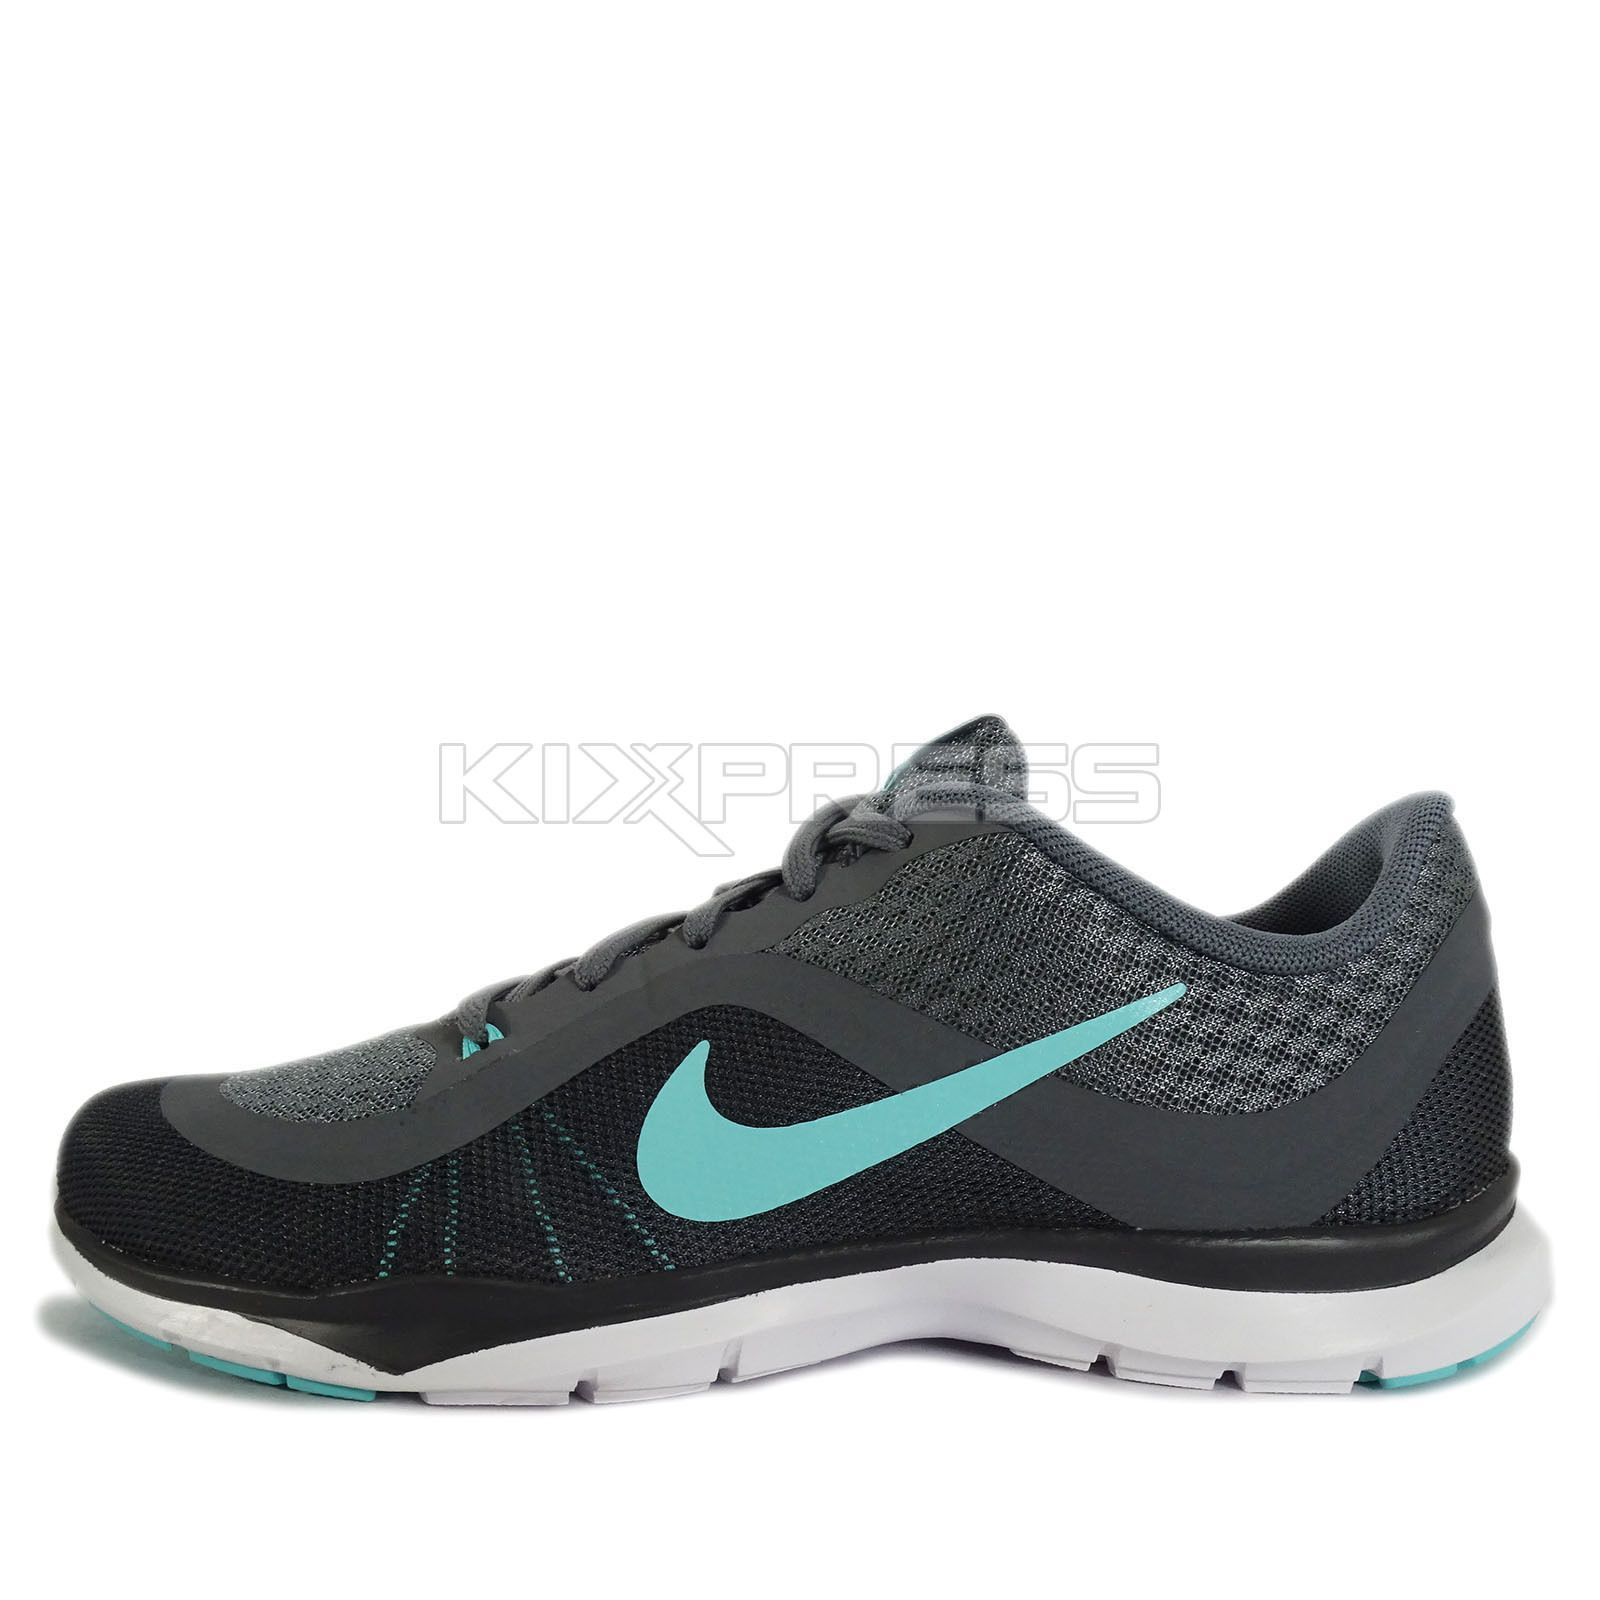 e028a31e95d37 WMNS Nike Flex Trainer 6  831217-004  Training Grey Turquoise-Black ...